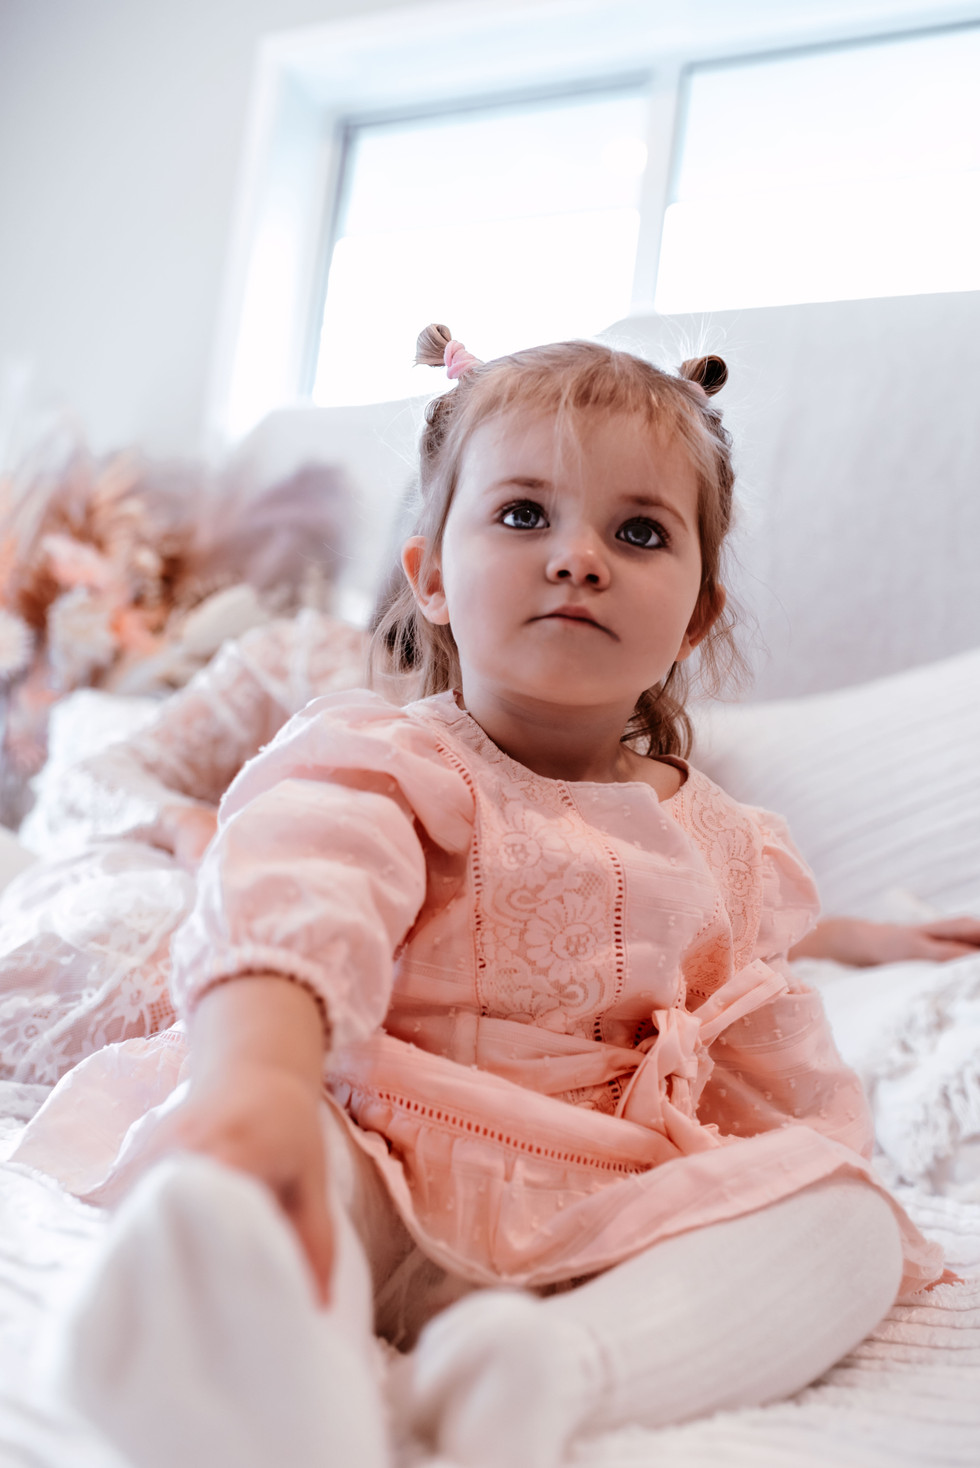 Home Maternity Photoshoot | Auckland New Zealand - www.zanthevorsatzphotography.com